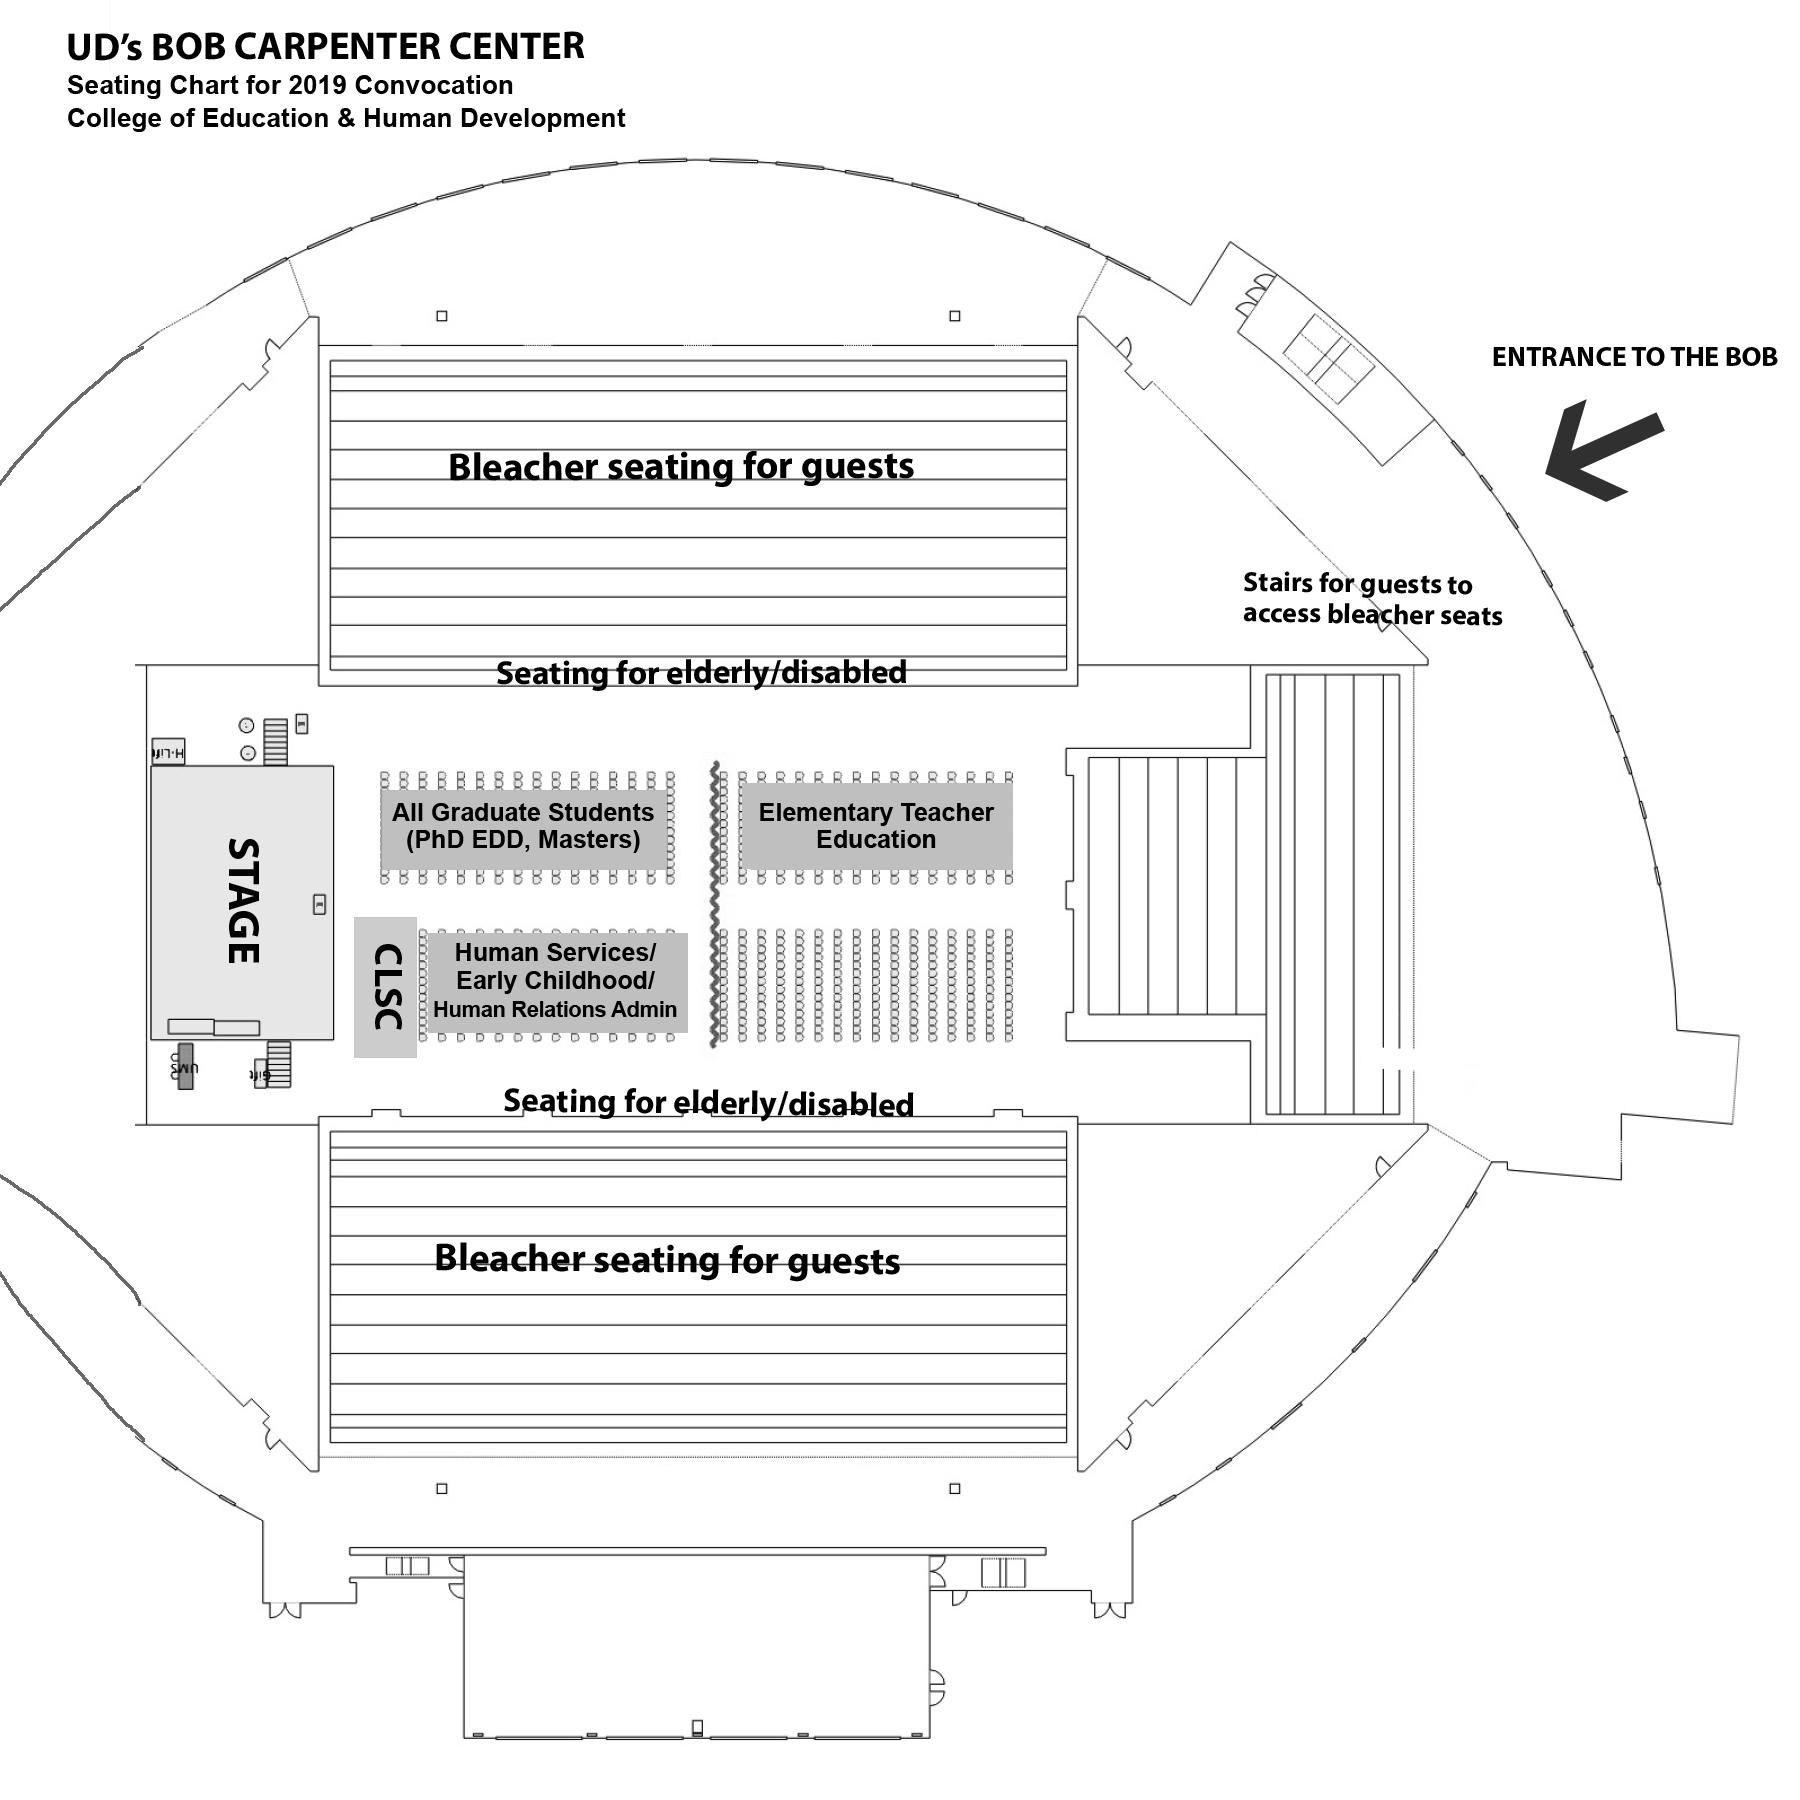 Bob Carpenter Center seating chart for graduation